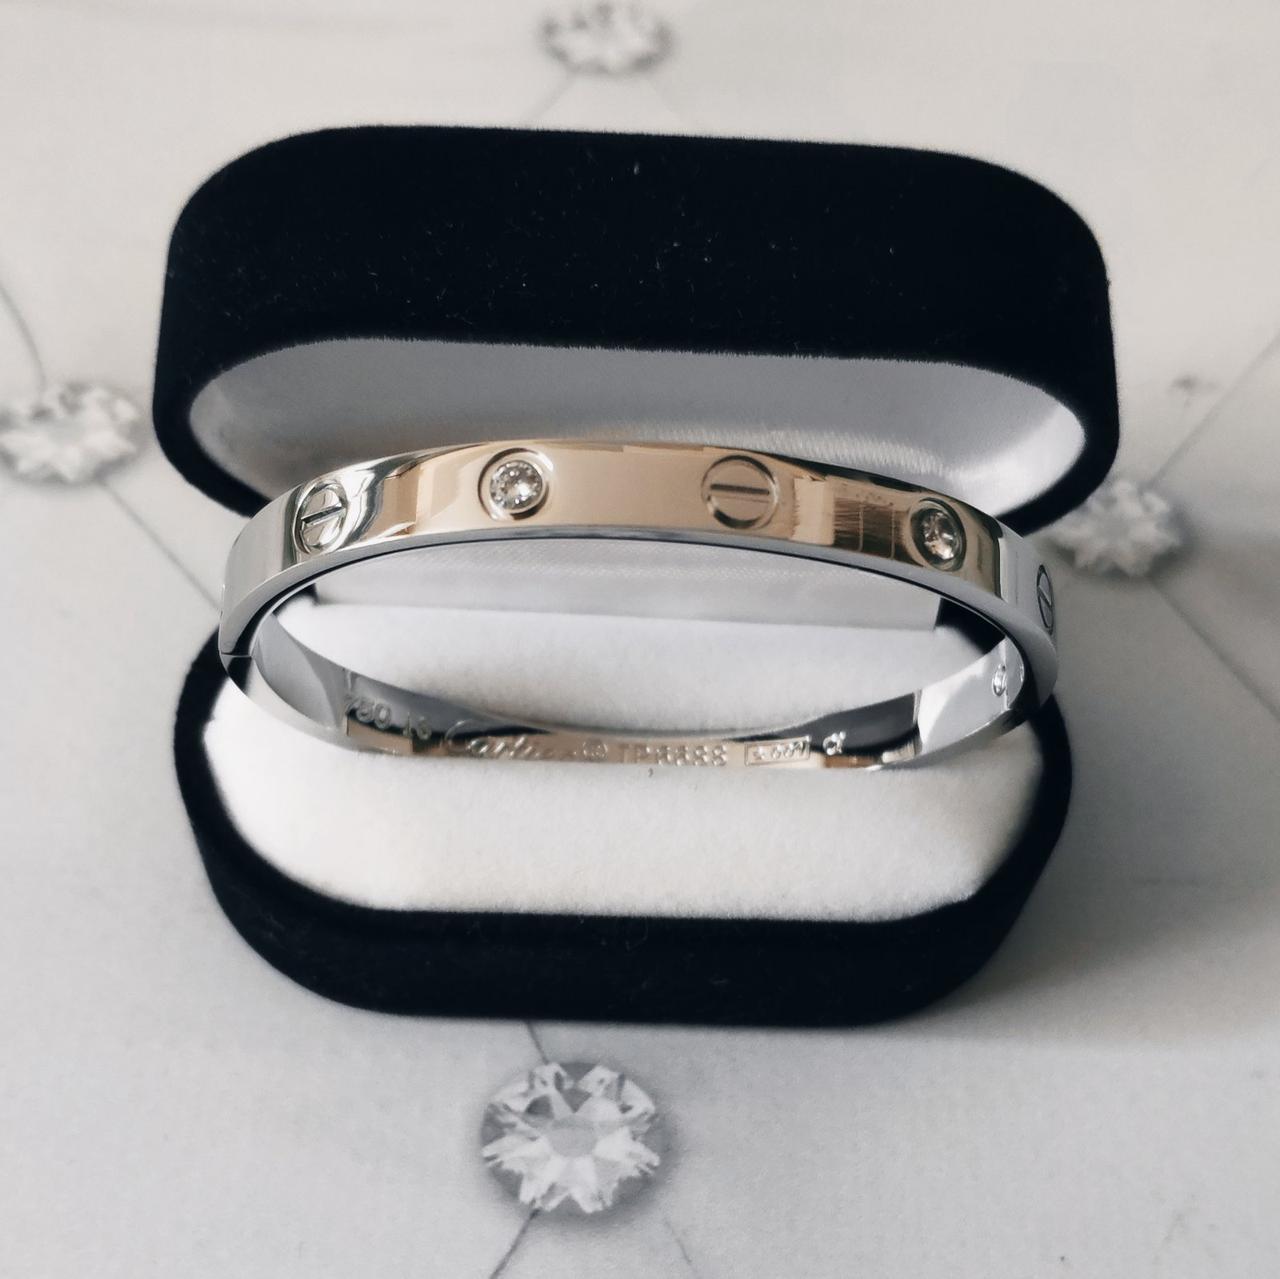 Браслет Кар тьє C artier Love 16S, 4 каменю, Біле Золото